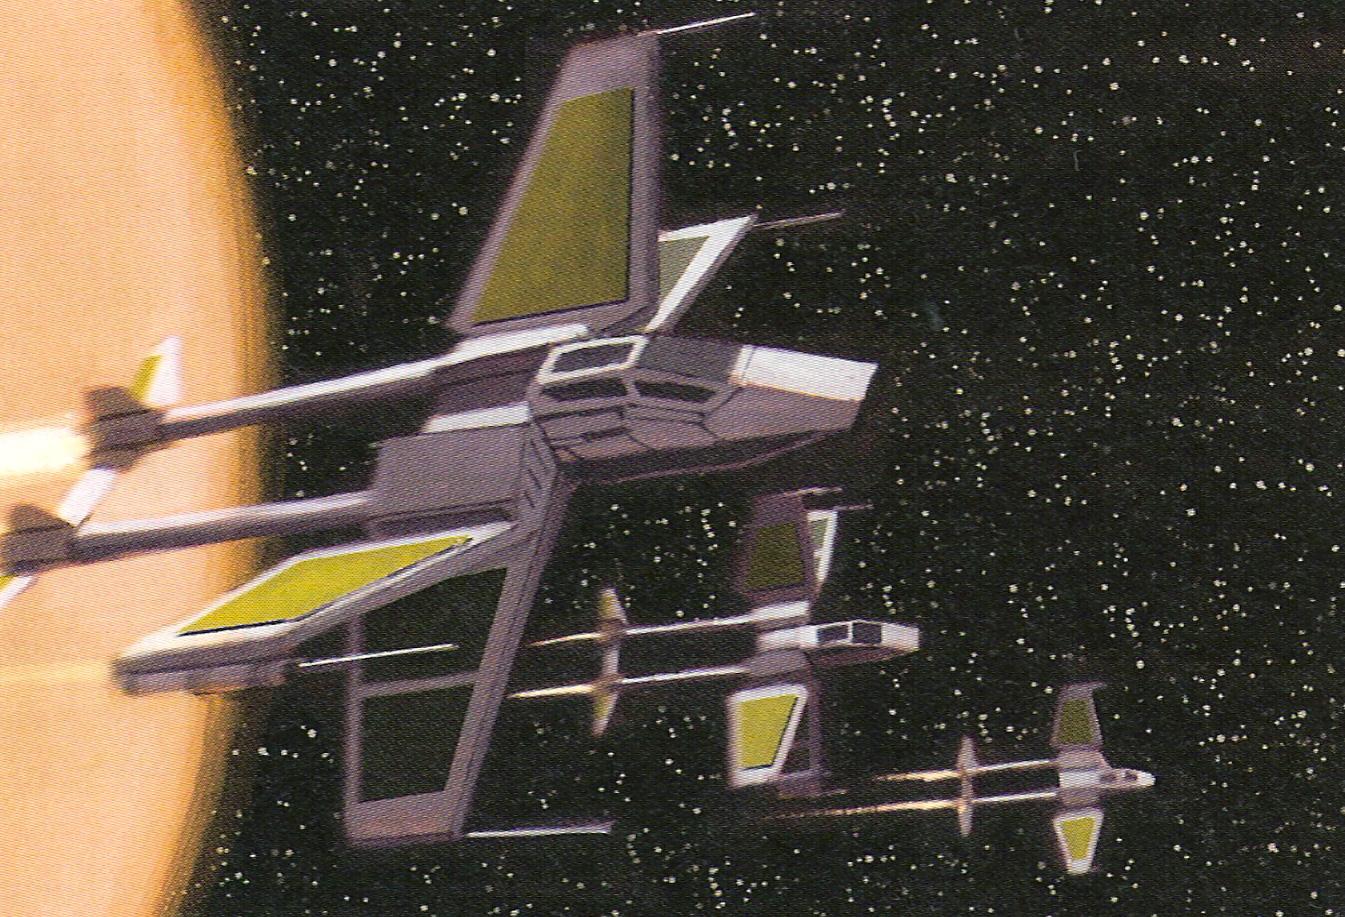 X-83 TwinTail starfighter